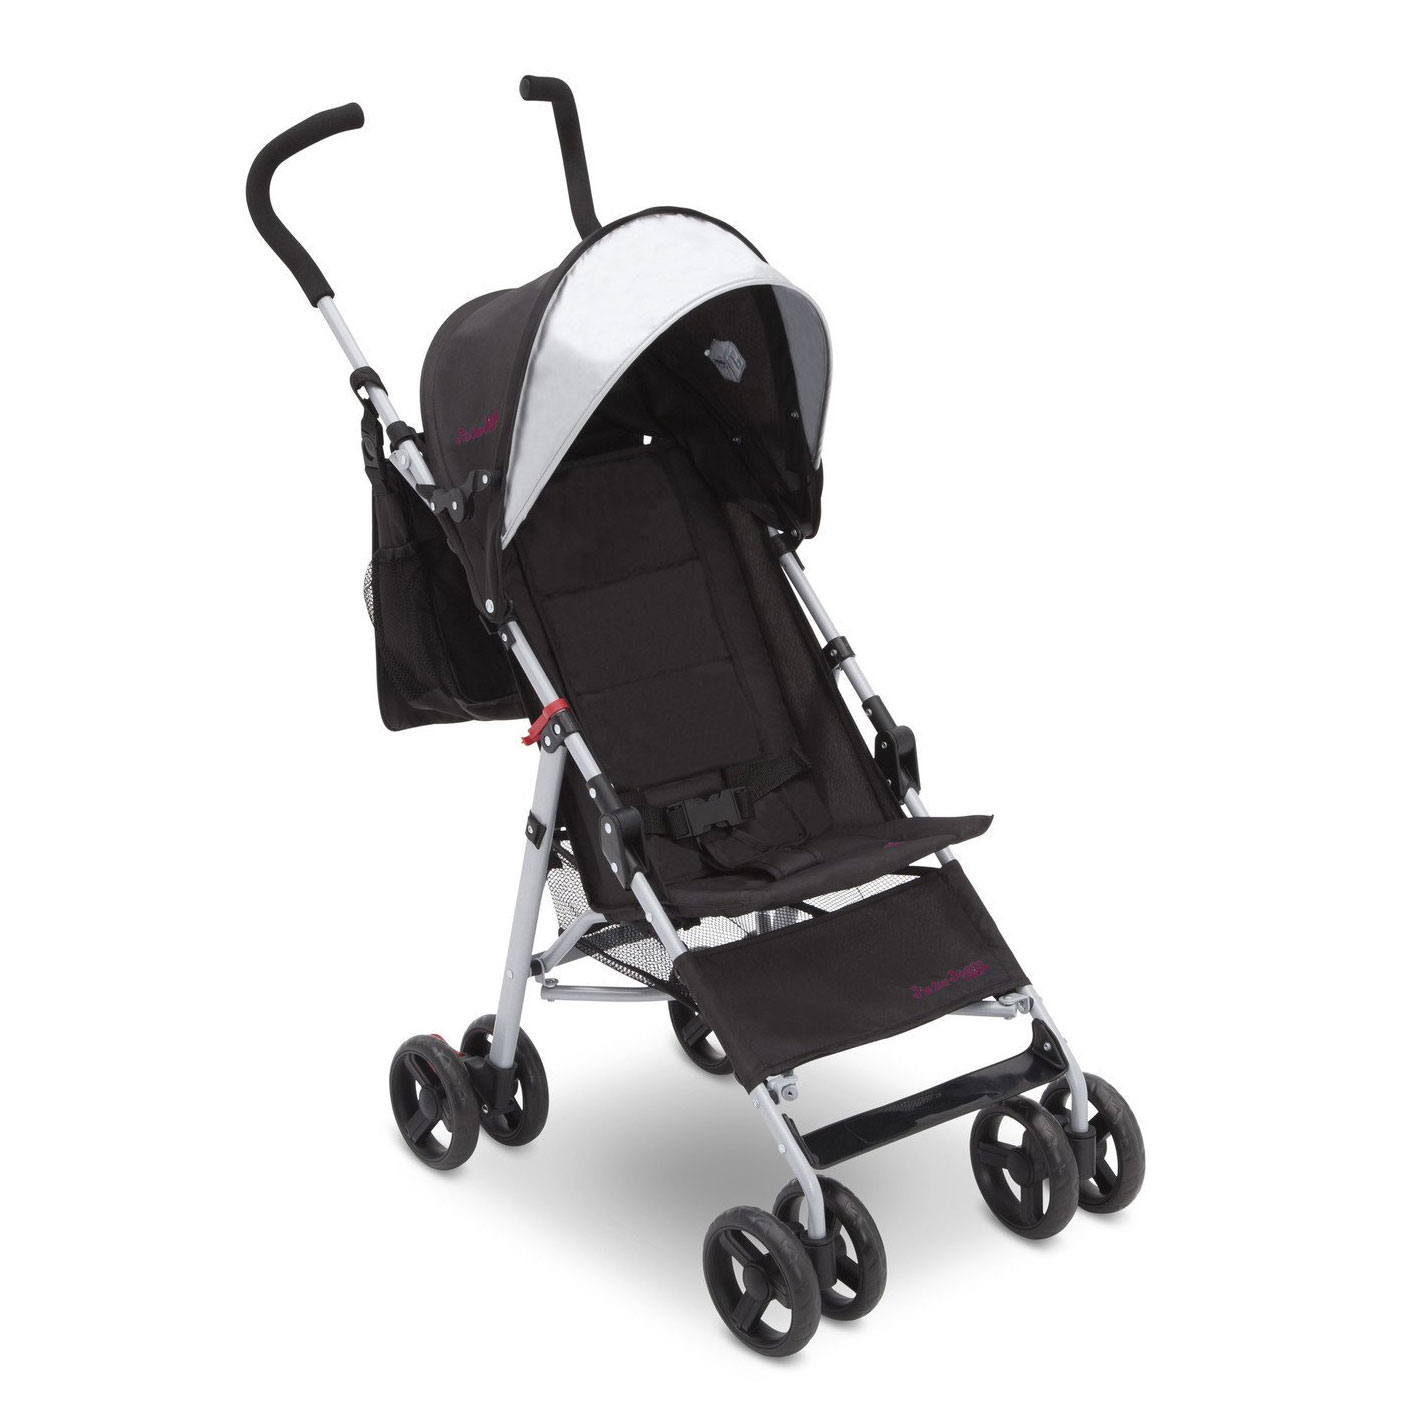 Delta J is for Jeep Brand Lightweight North Star Infant Baby Umbrella Stroller